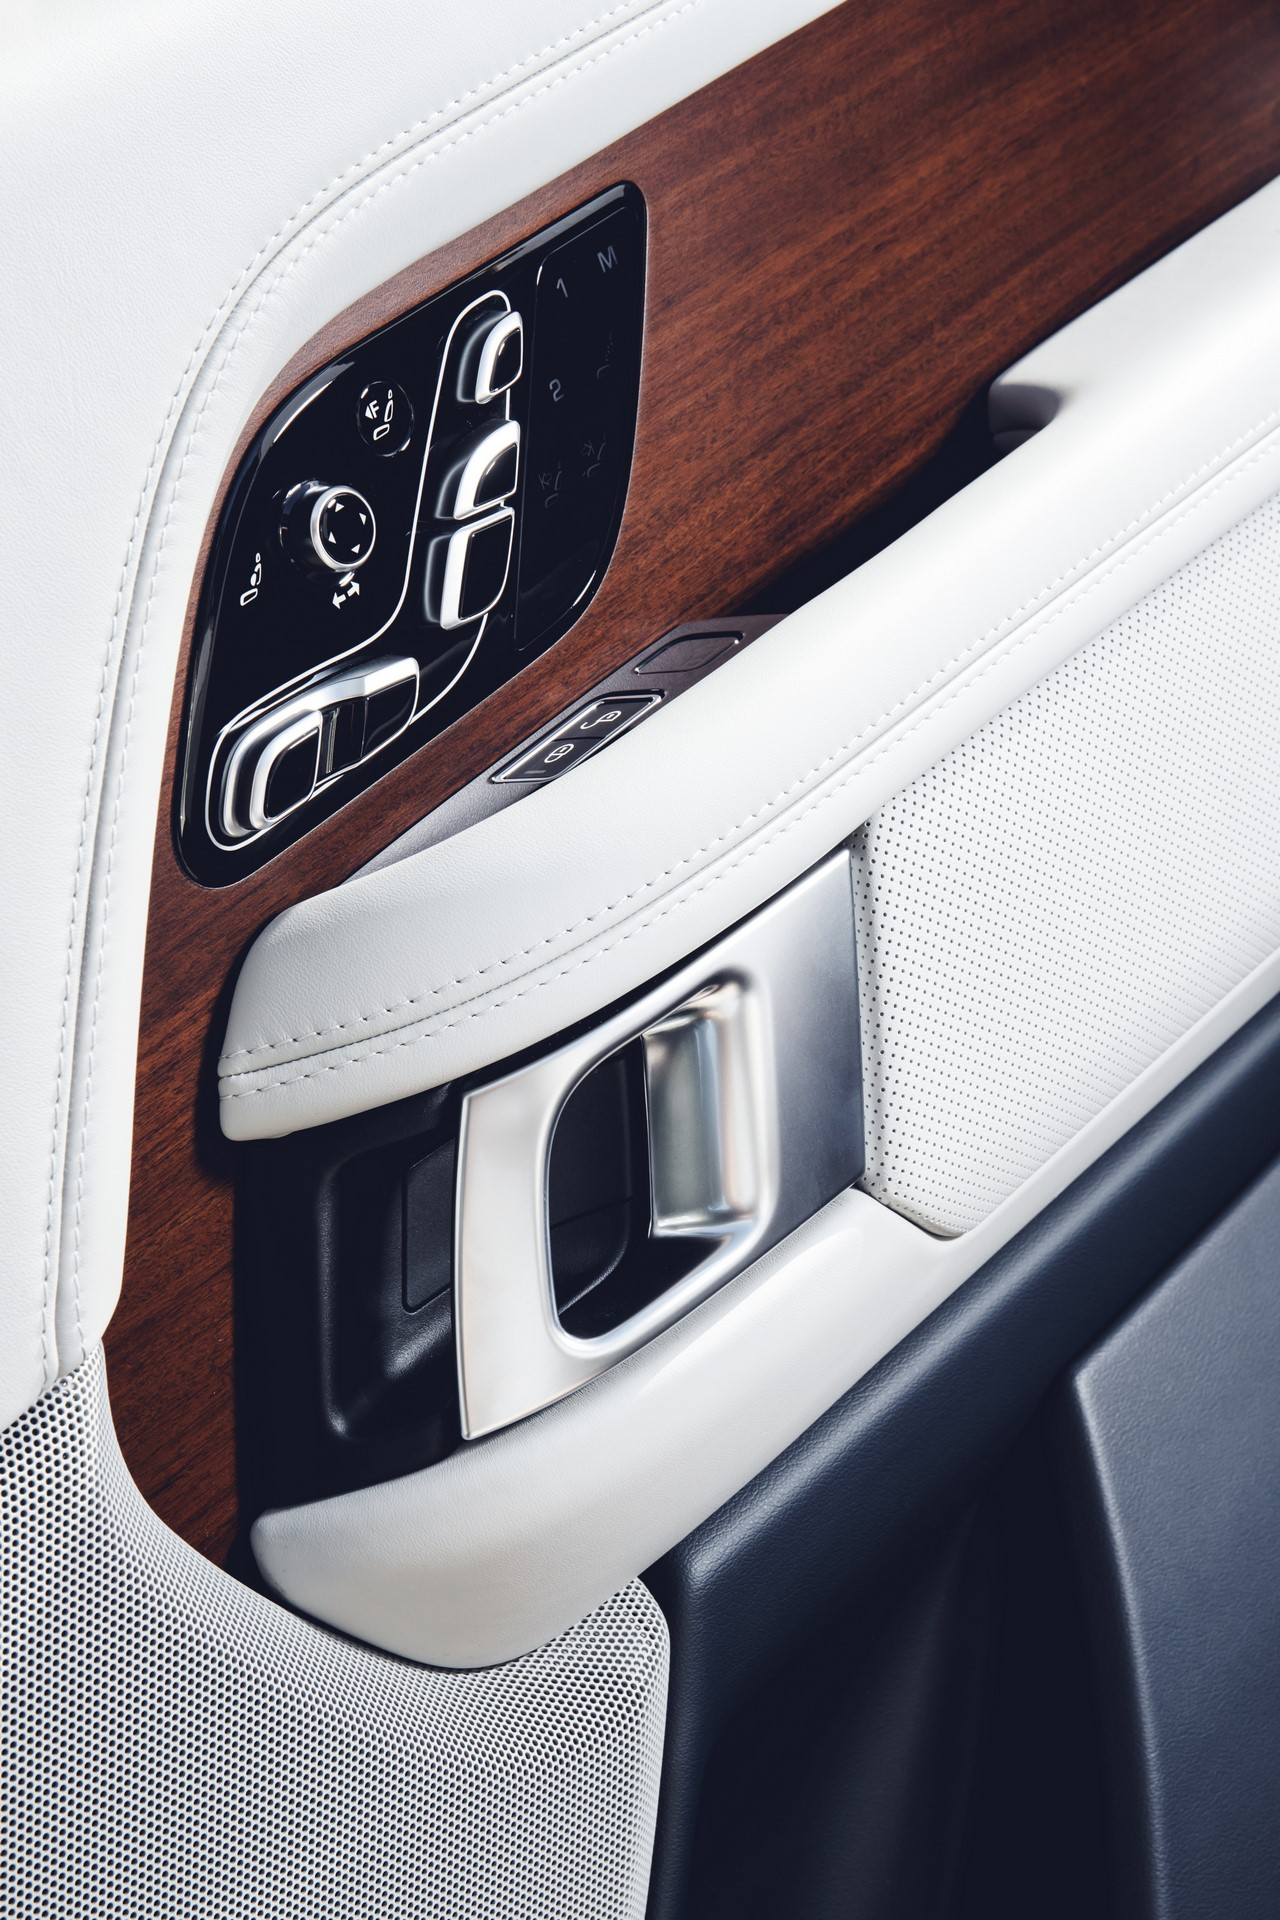 Range Rover SVAutobiography 2018 (7)